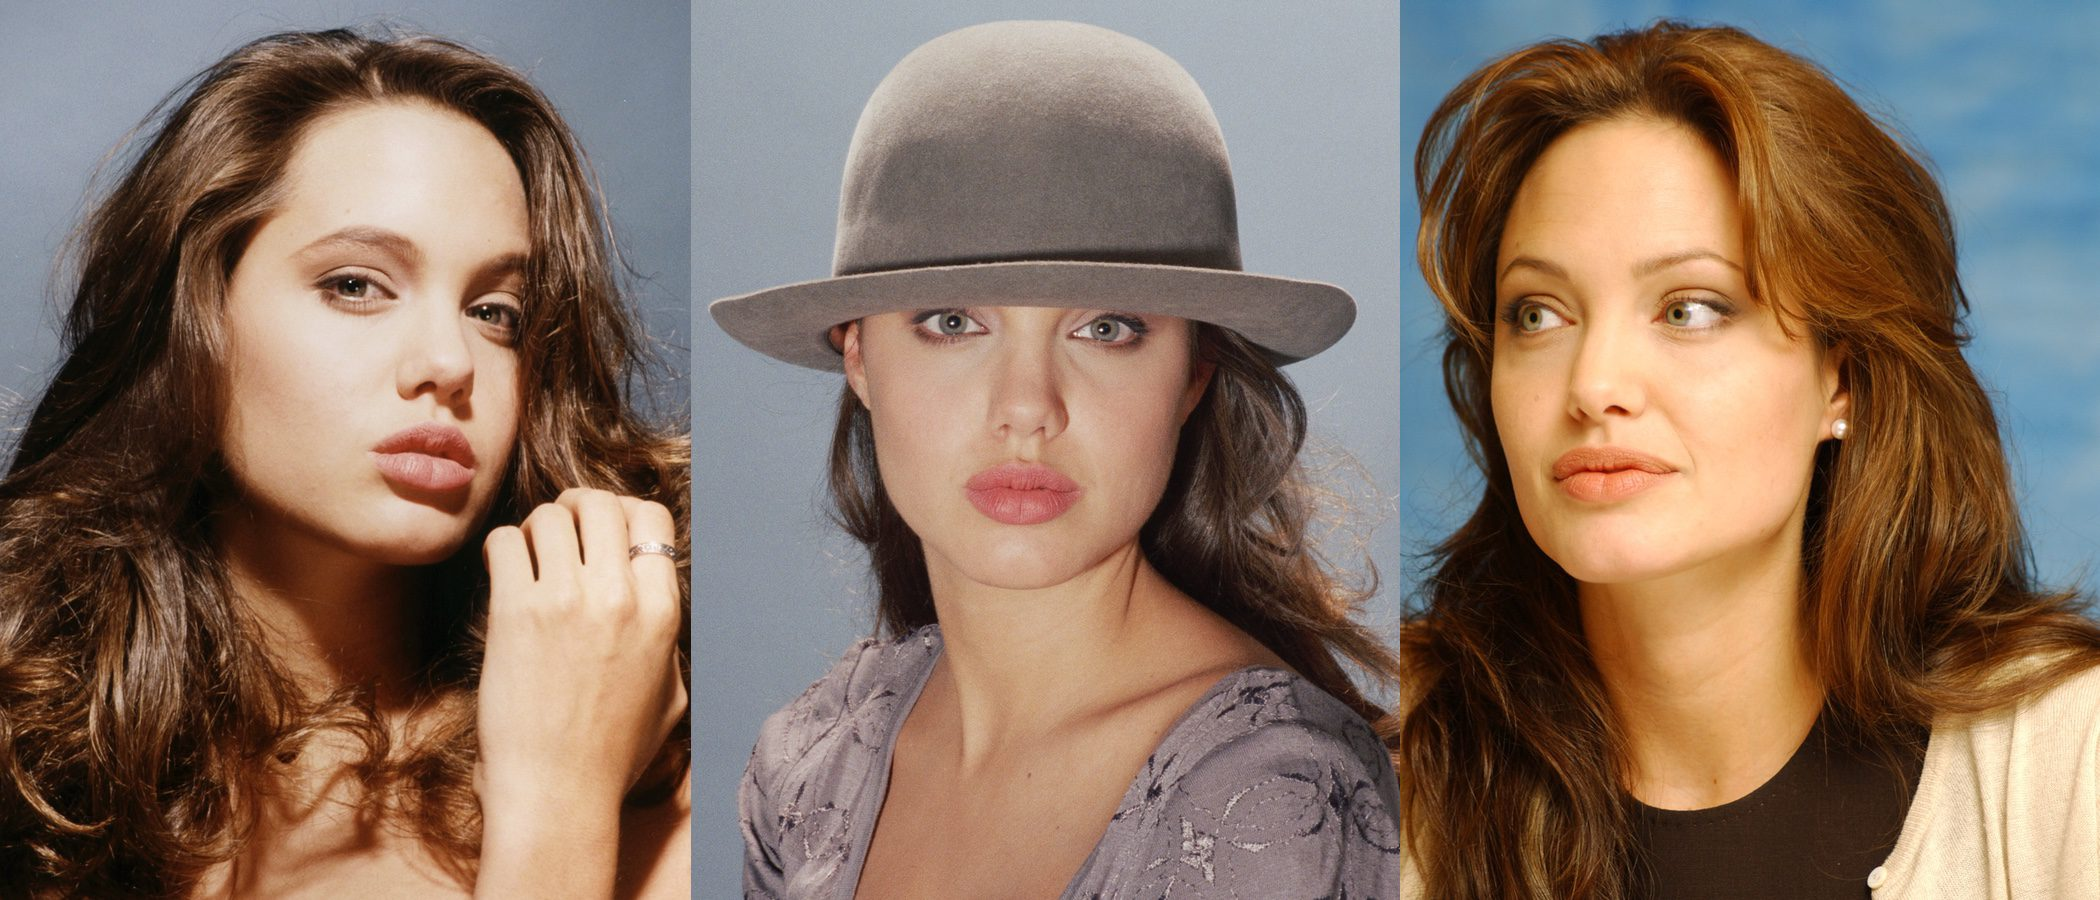 Los mejores beauty looks de Angelina Jolie